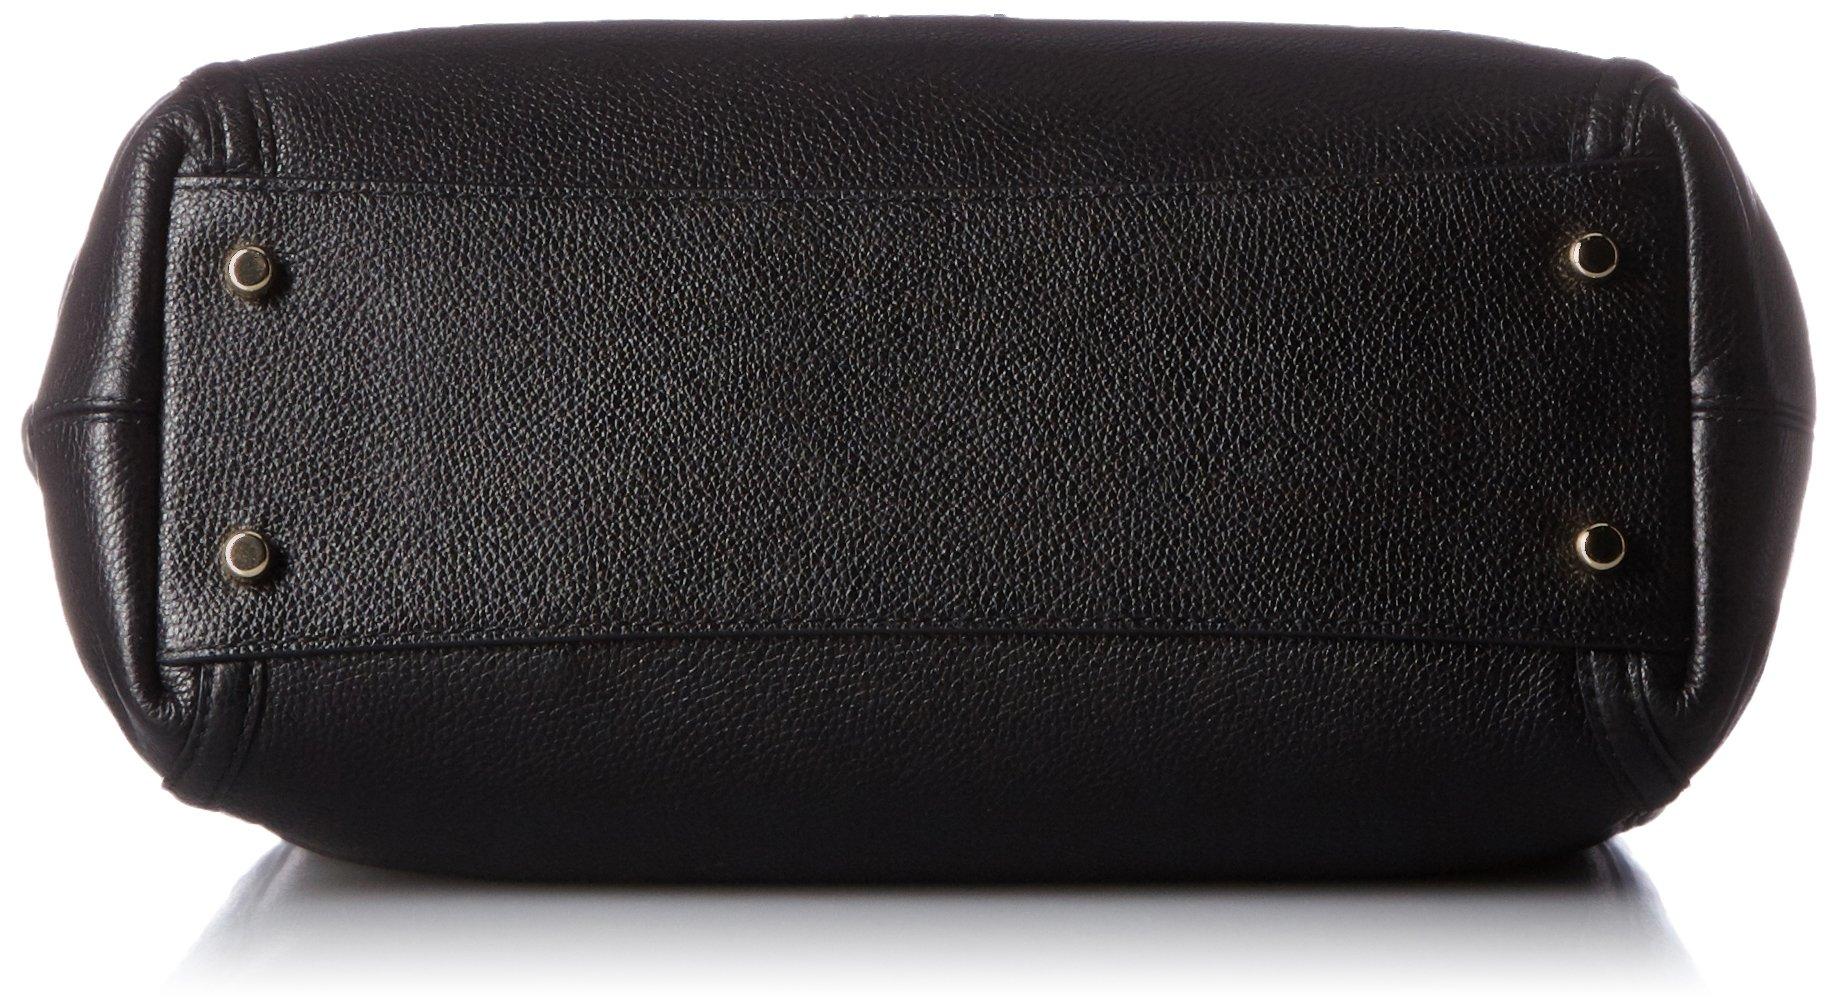 COACH Women's Turnlock Edie LI/Black Shoulder Bag by Coach (Image #4)